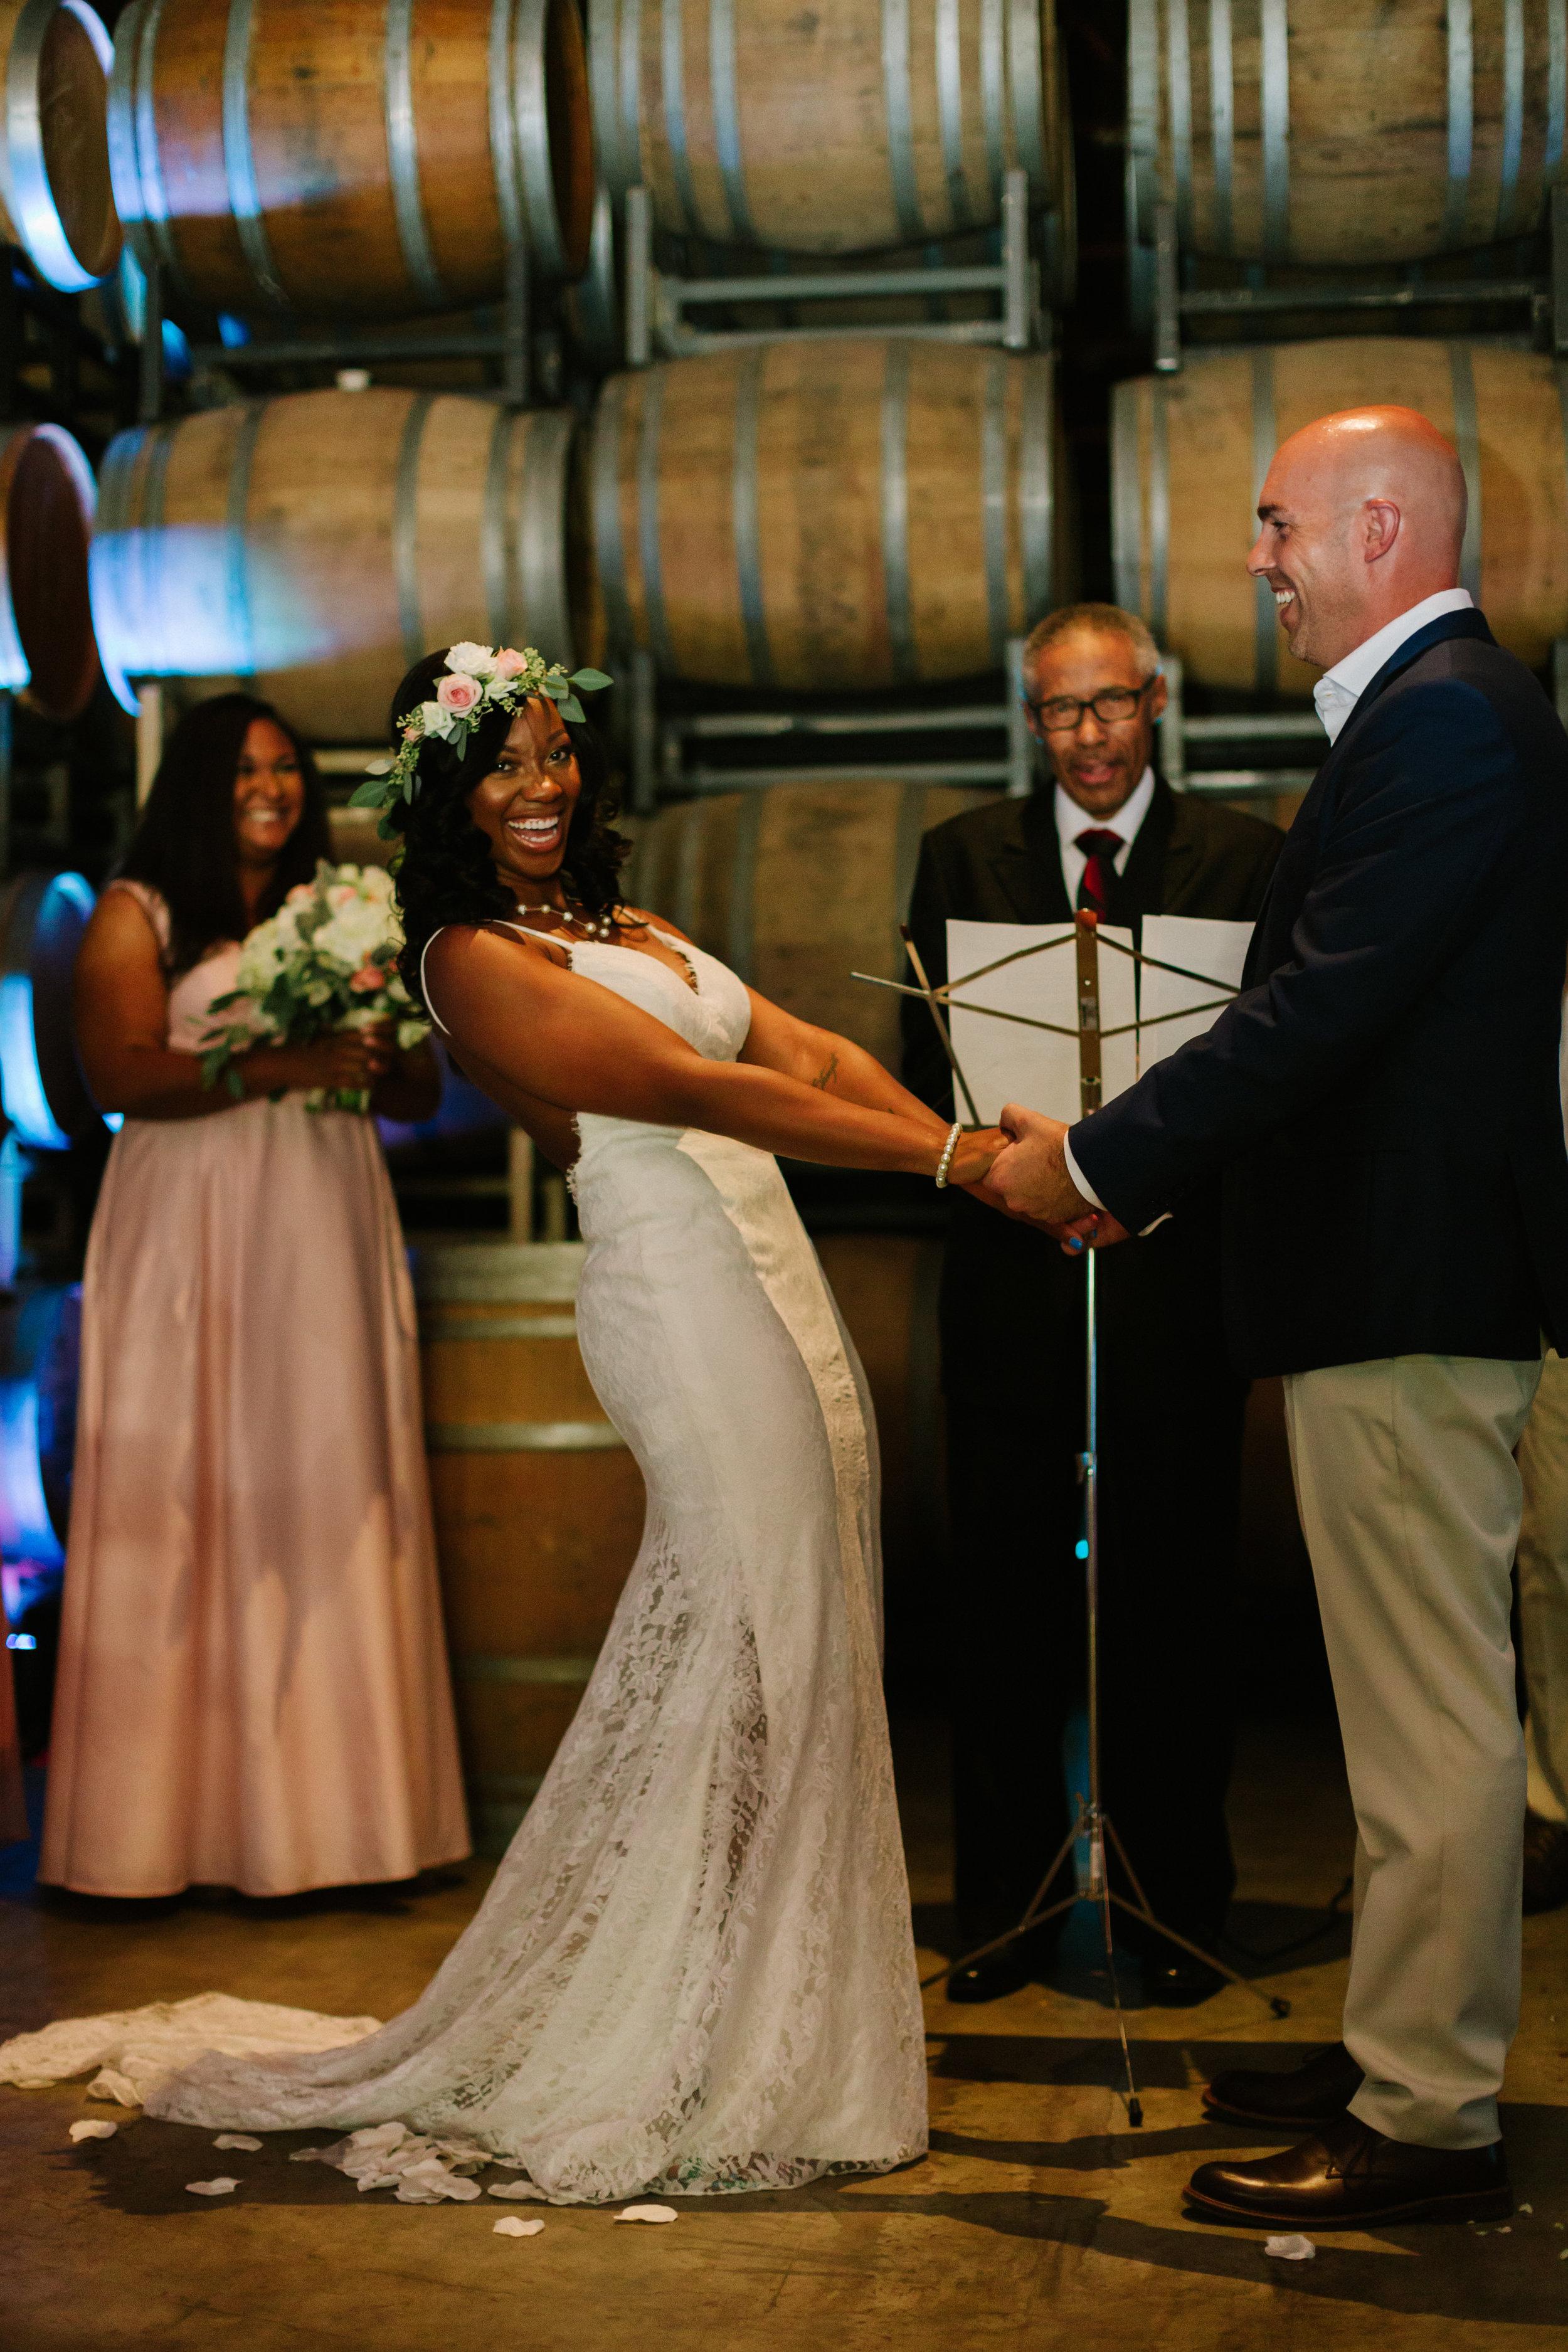 2017.09.16 Ashley and Chuck O'Day Quantam Leap Winery Wedding (183 of 462).jpg